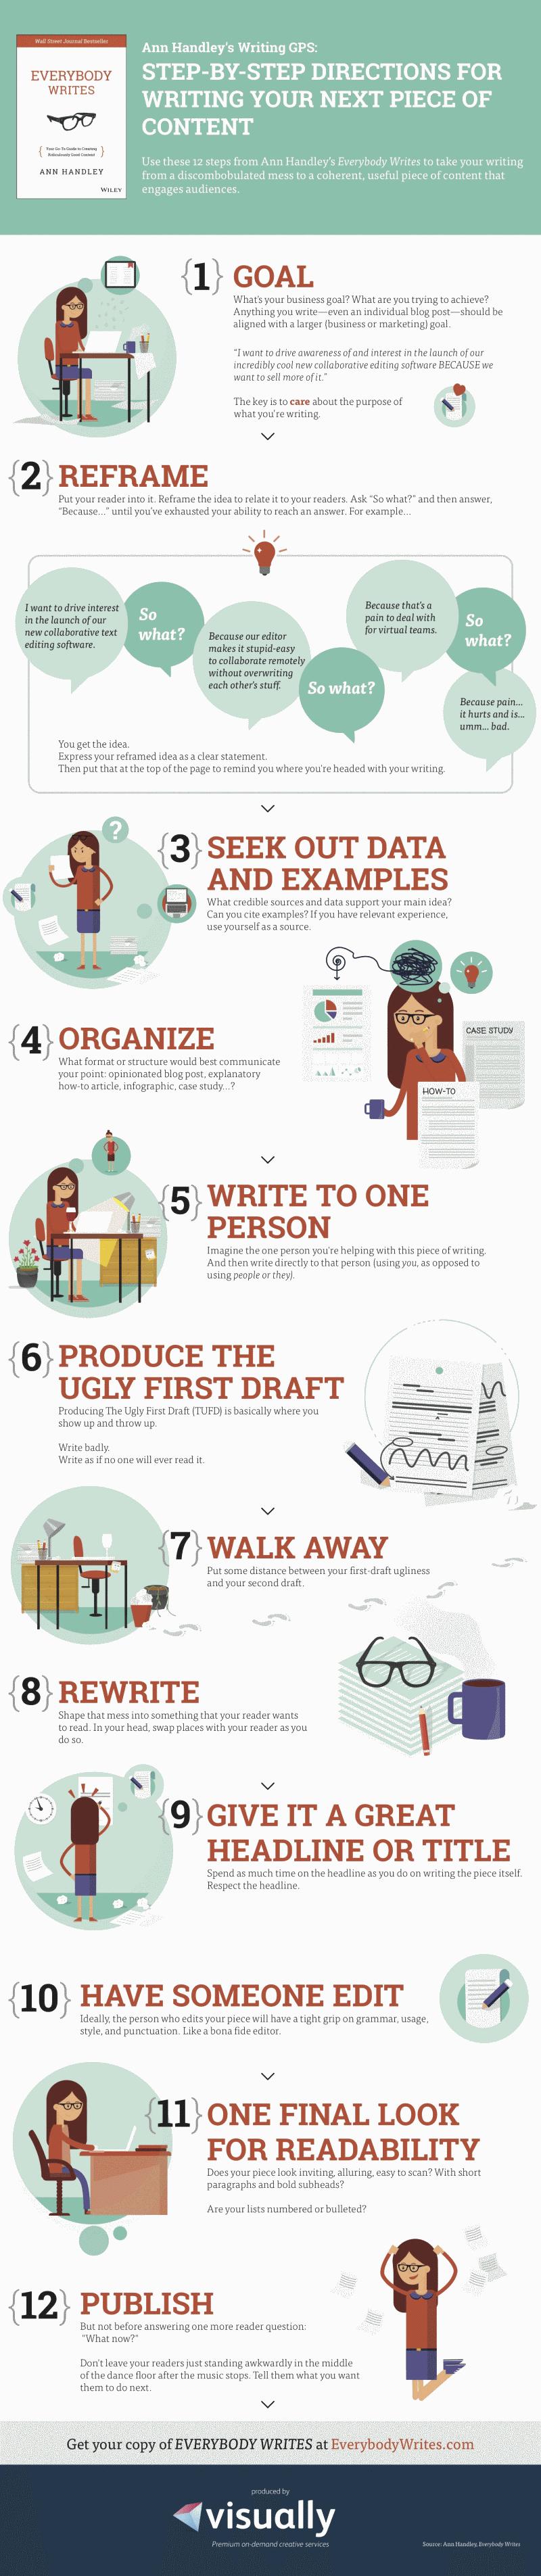 ann handley: everybody write, infographic